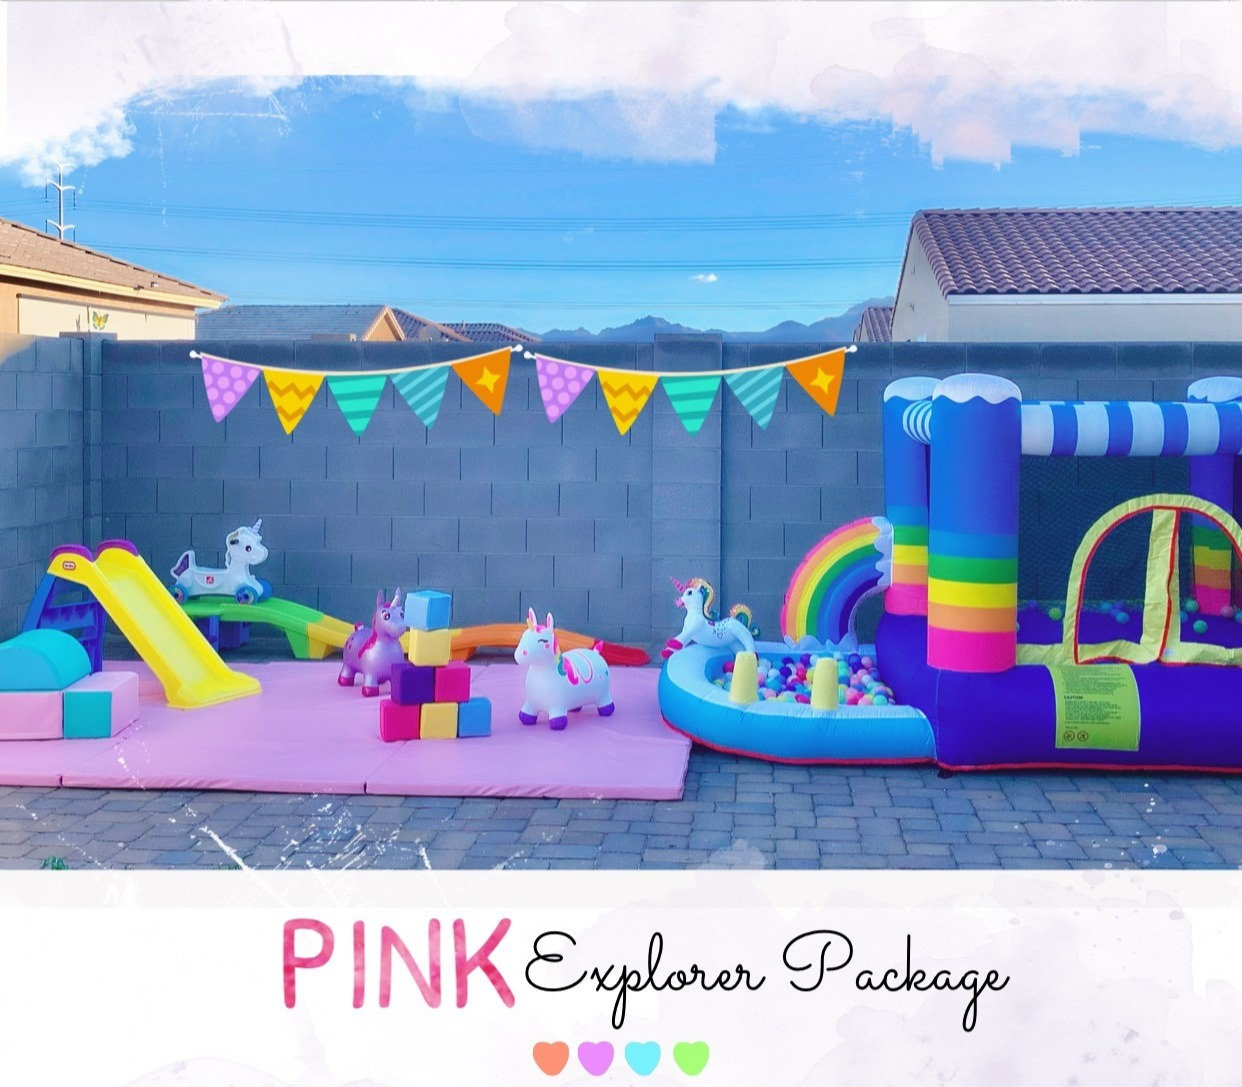 PINK Explorer Package